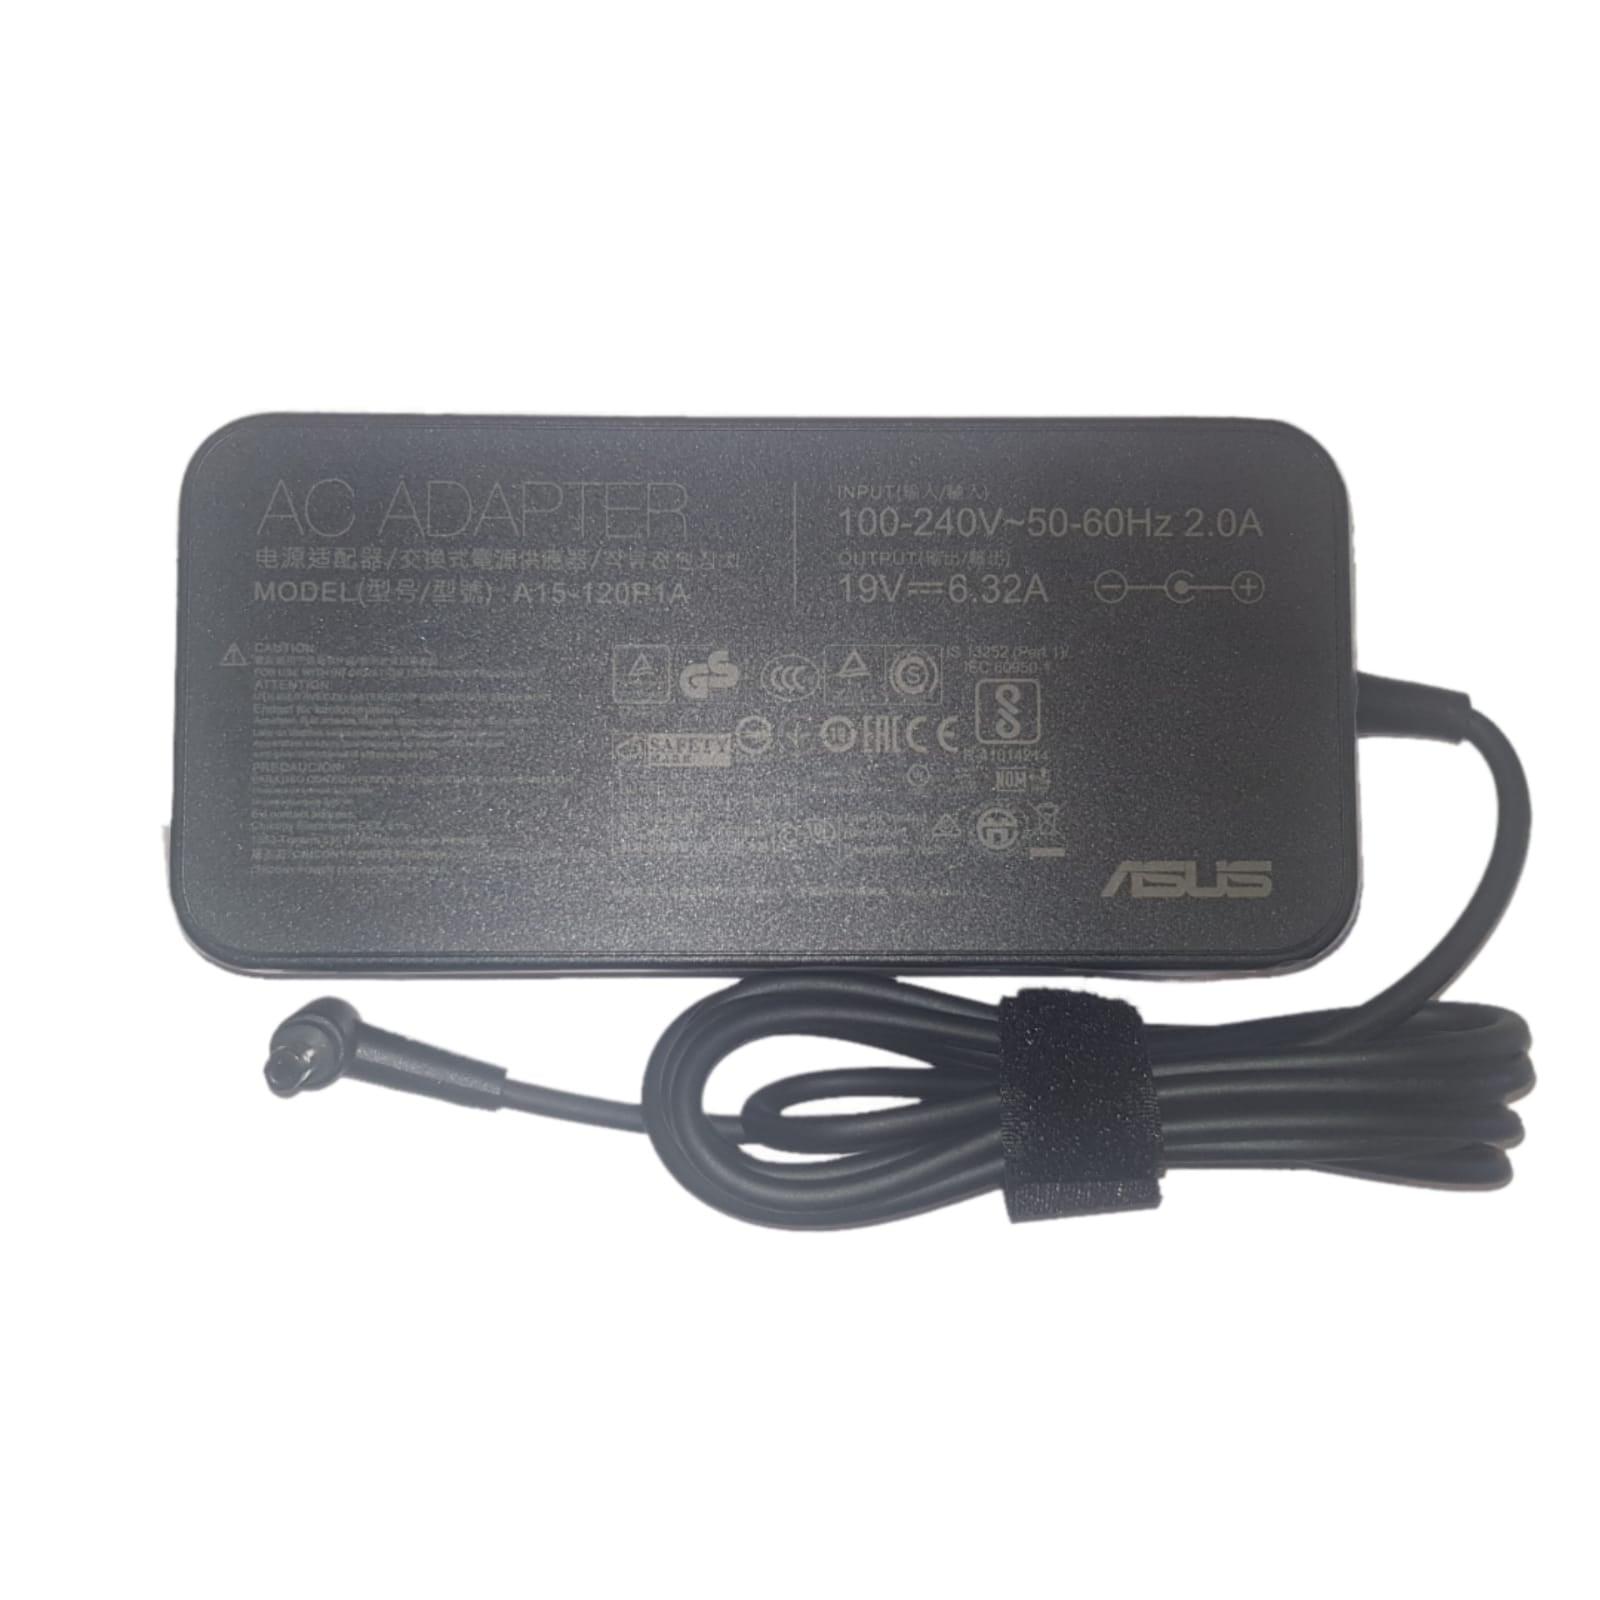 מטען למחשב נייד אסוס Asus X750LB